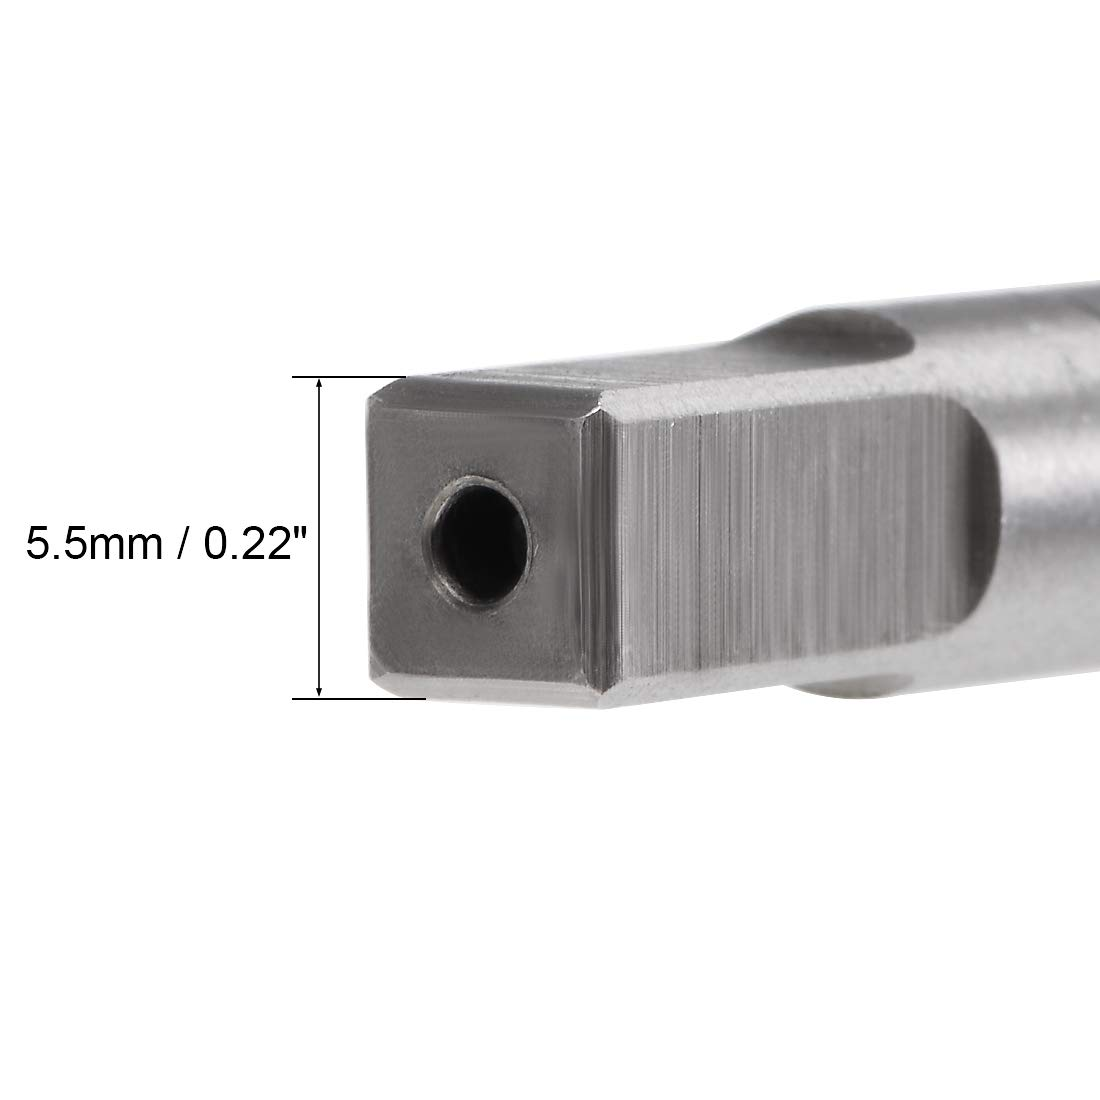 uxcell Machine Tap 6-40 UNF Thread Pitch 2A Class 3 Flutes High Speed Steel